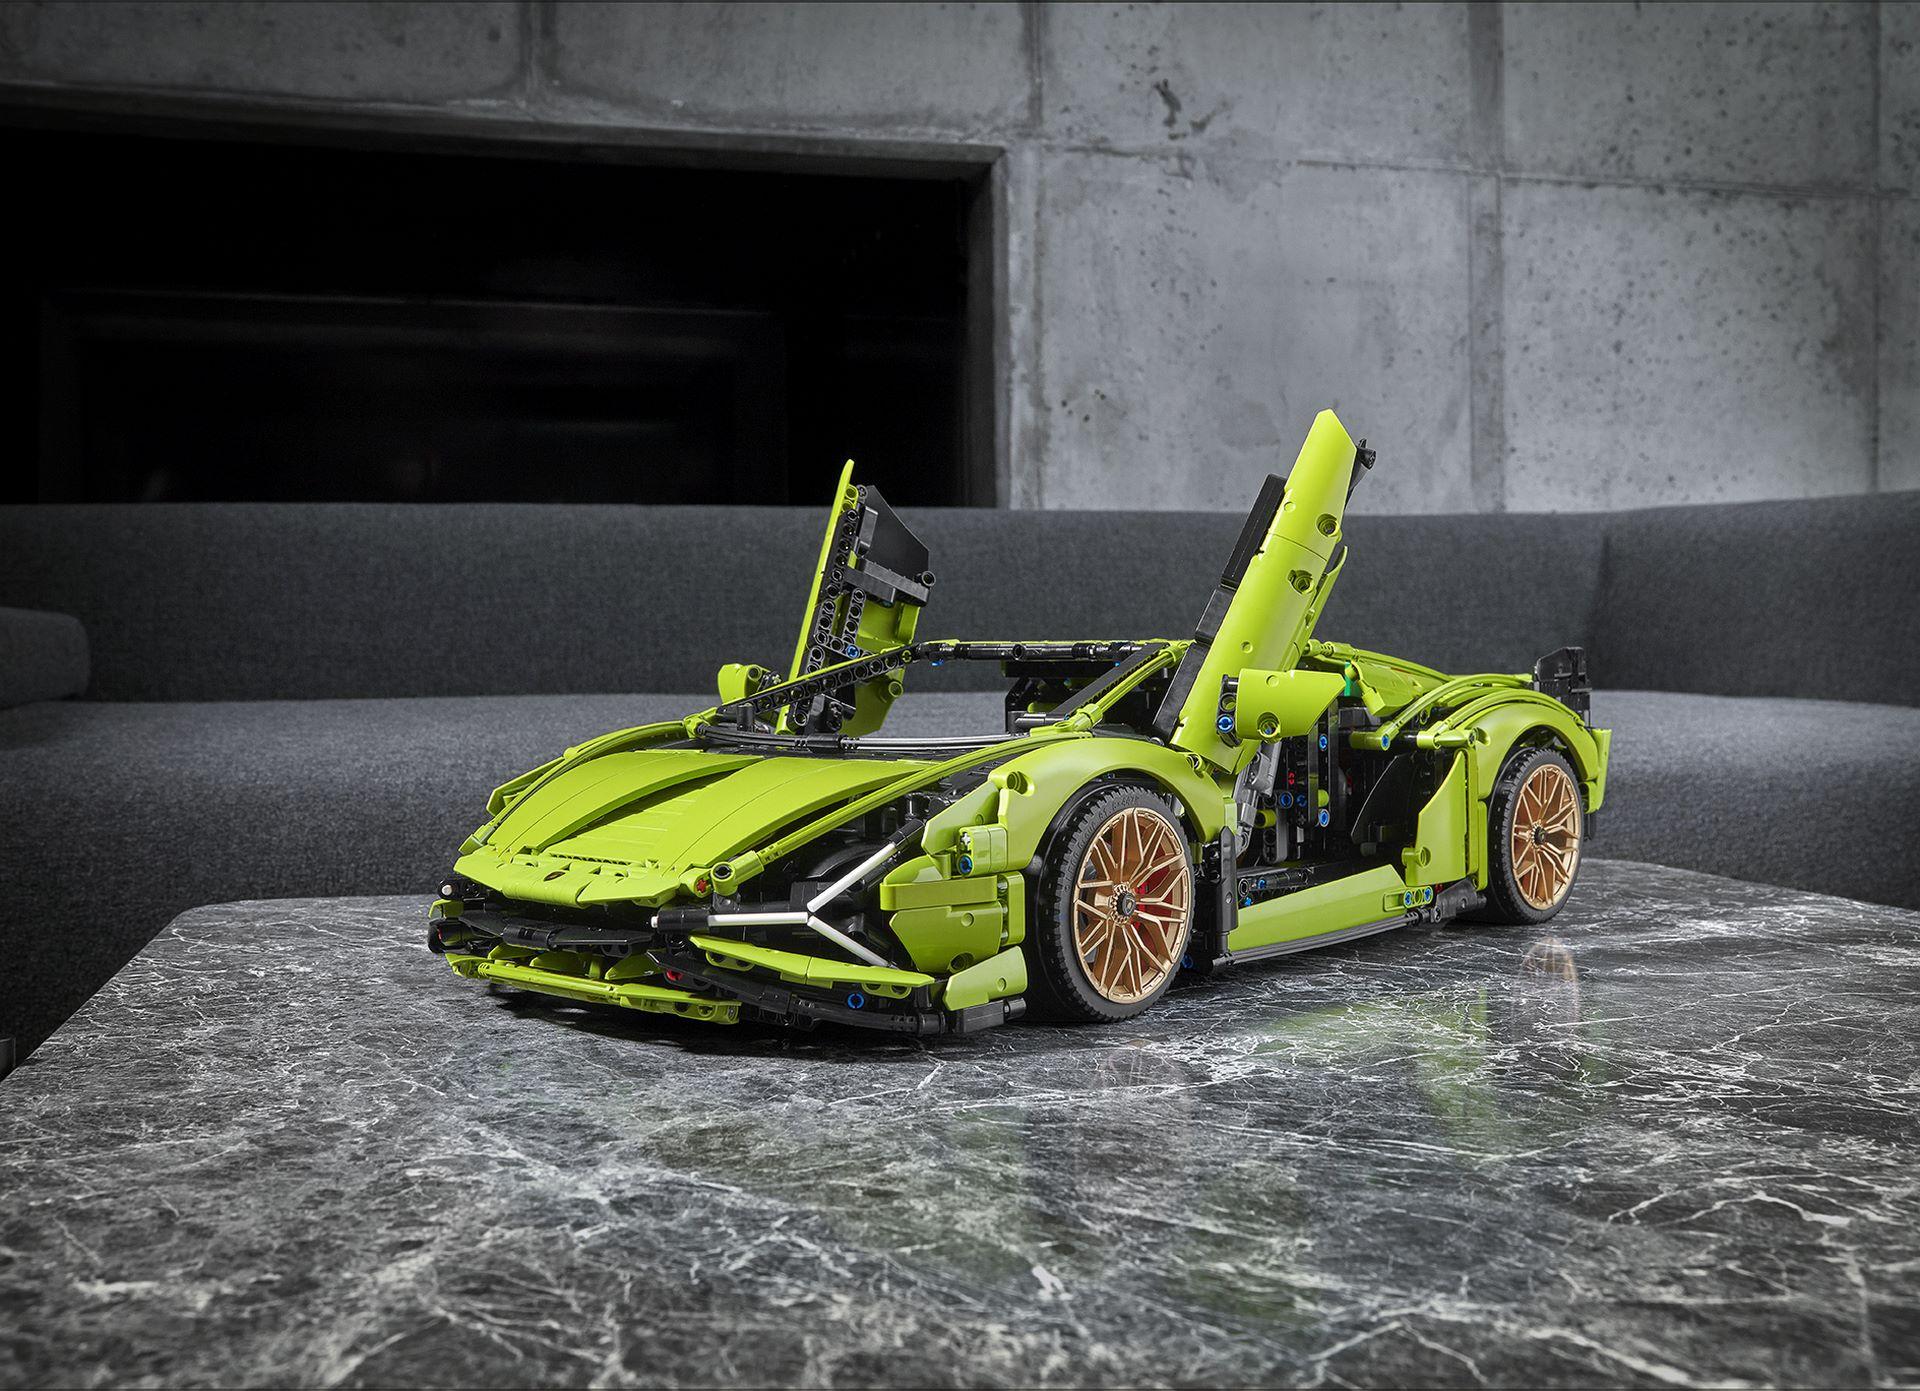 Lamborghini-Sian-FKP-37-Lego-Technic-2